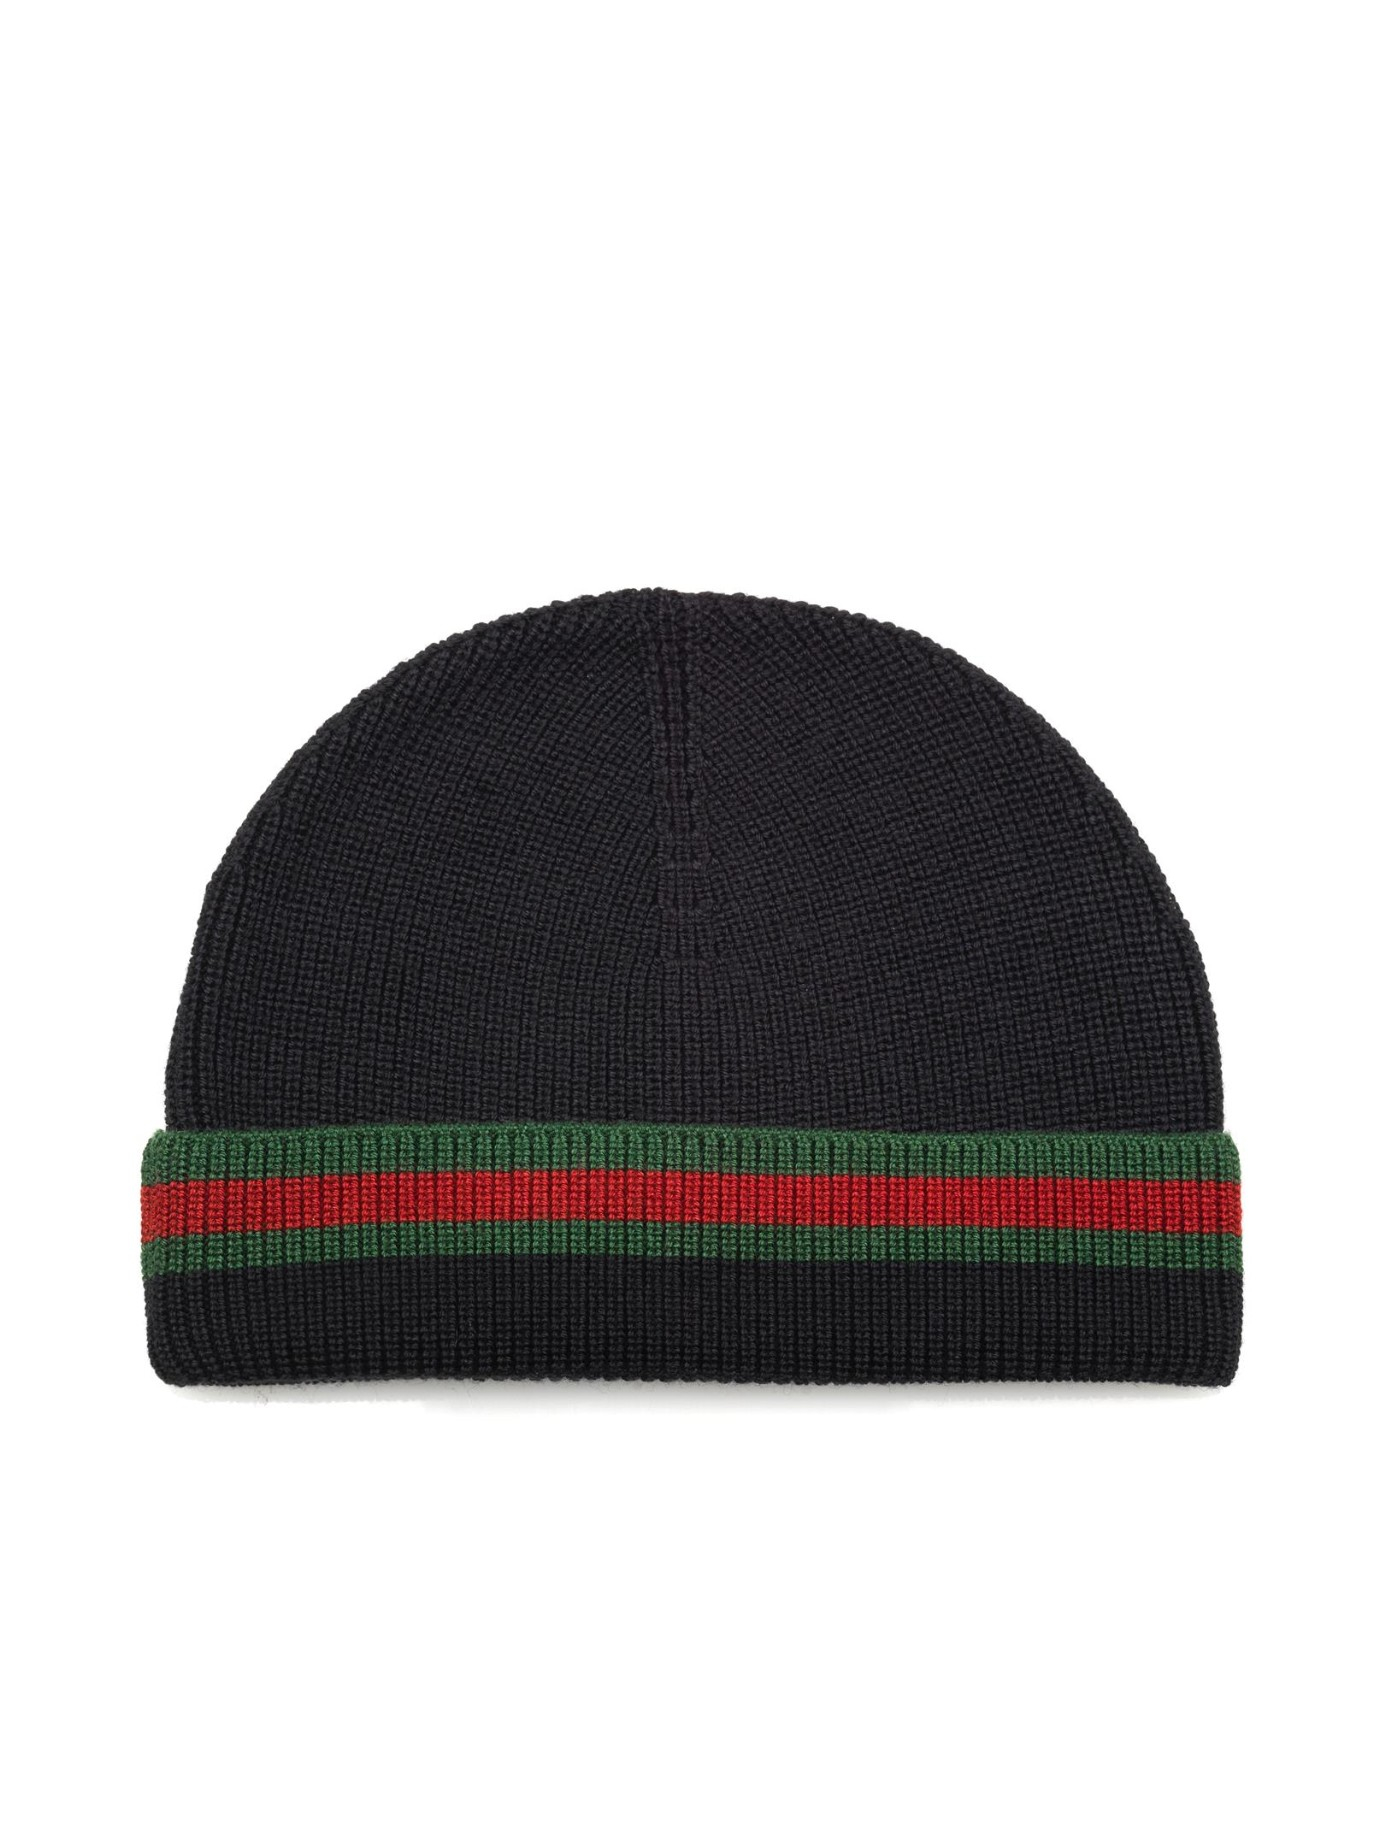 2eba528d4a34 Gucci Webbed Hem Wool And Silk-Blend Hat in Black for Men - Lyst